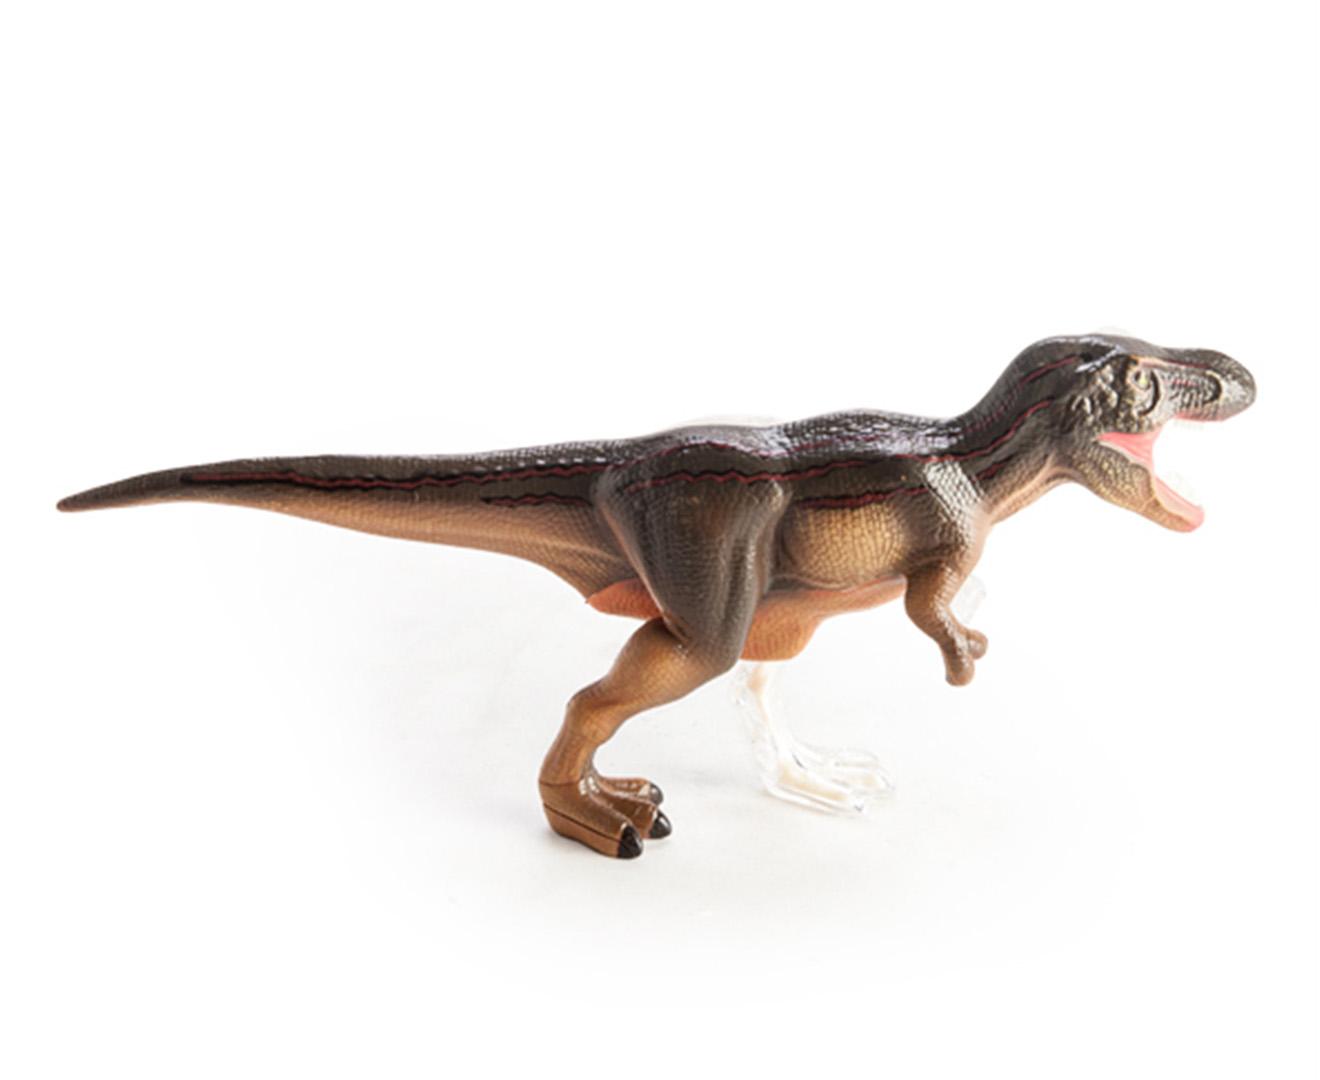 4D Vision - T-Rex anatomy model 9318051113442   eBay